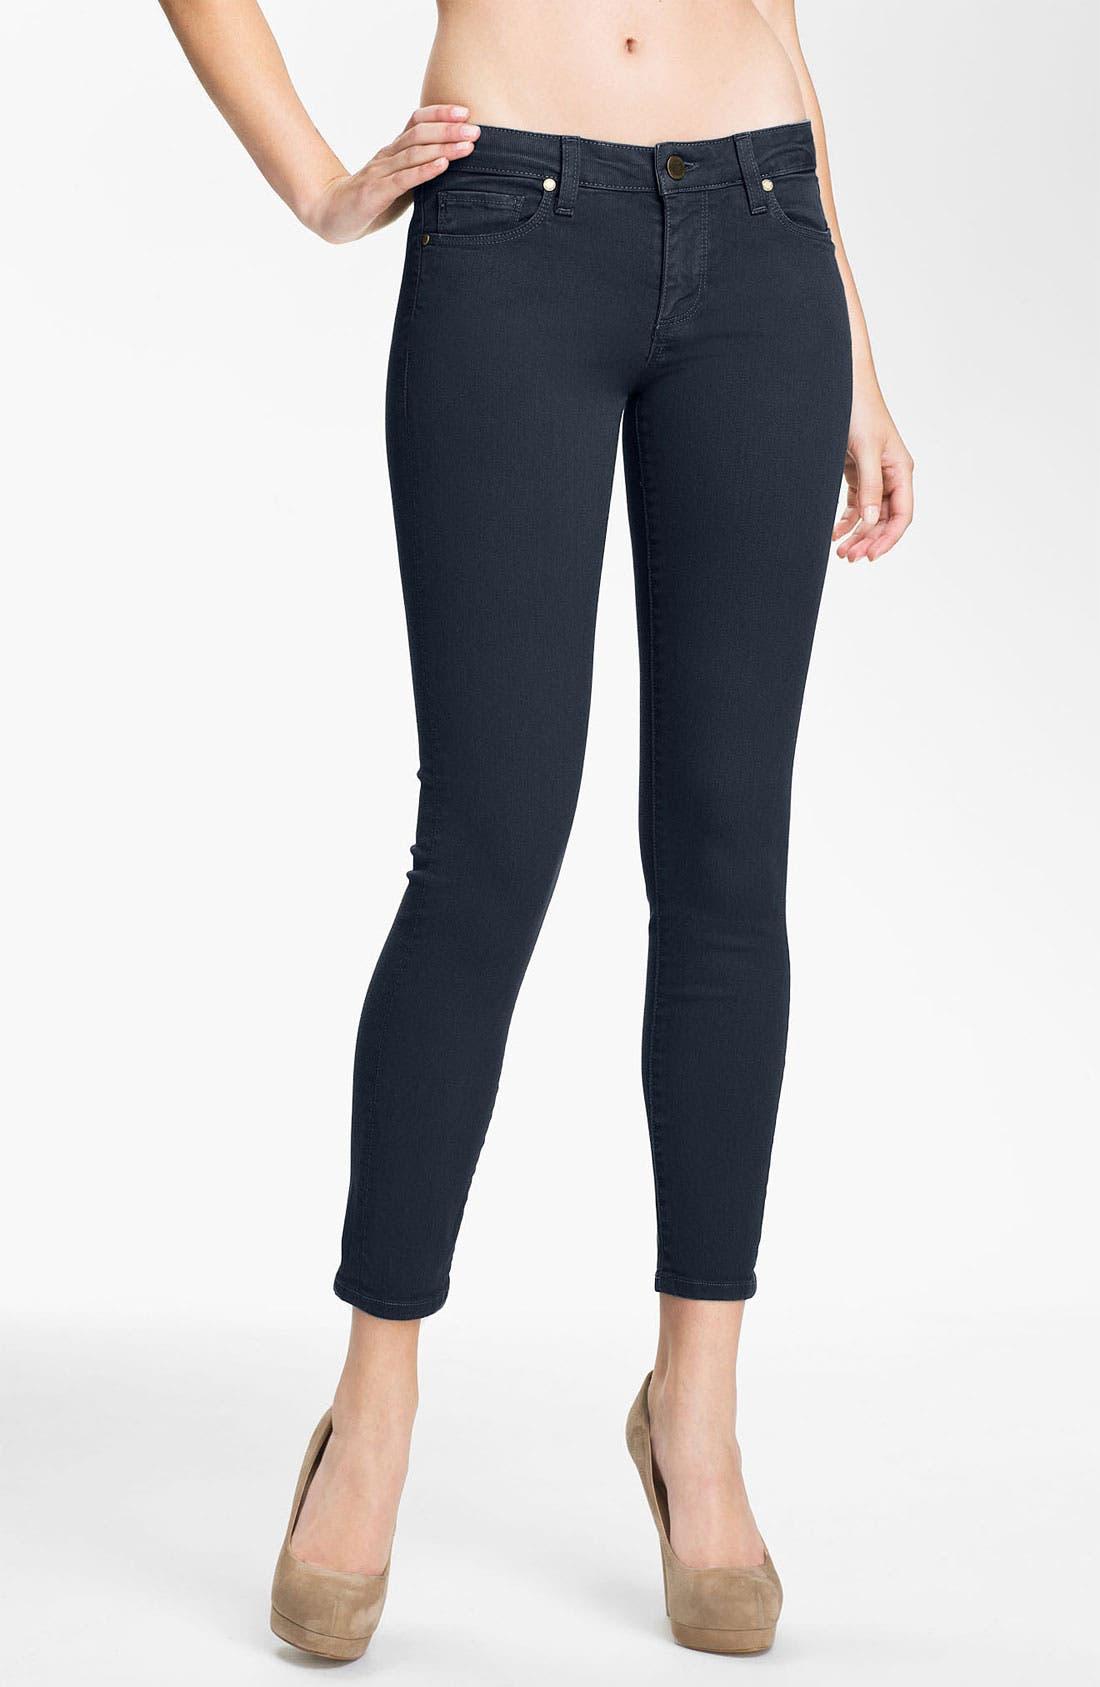 Alternate Image 1 Selected - Paige Denim 'Skyline' Ankle Peg Skinny Stretch Jeans (Drift)